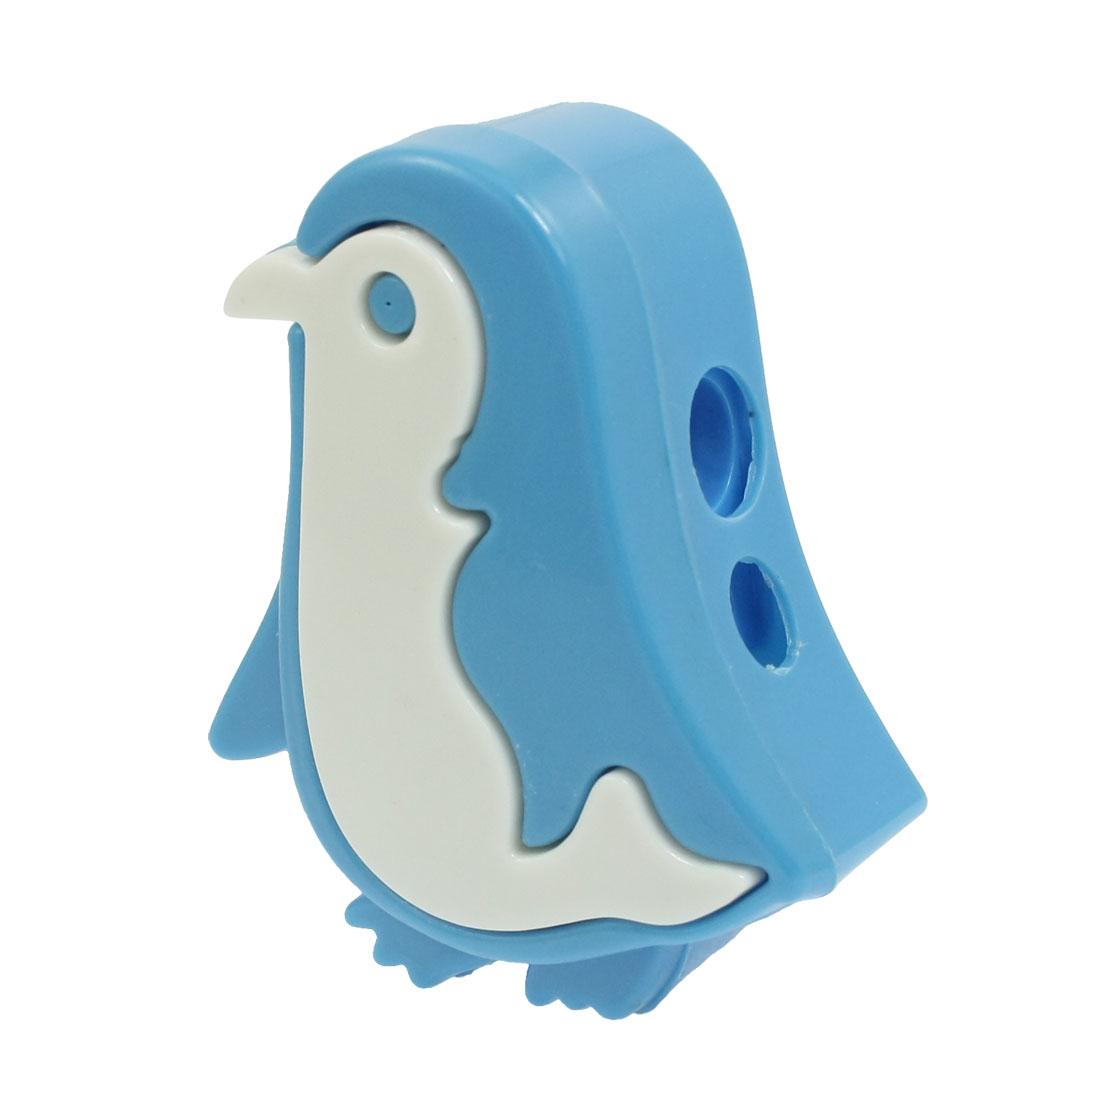 Stationery Plastic Penguin Shape Double Holes Pencil Sharpener Light Blue